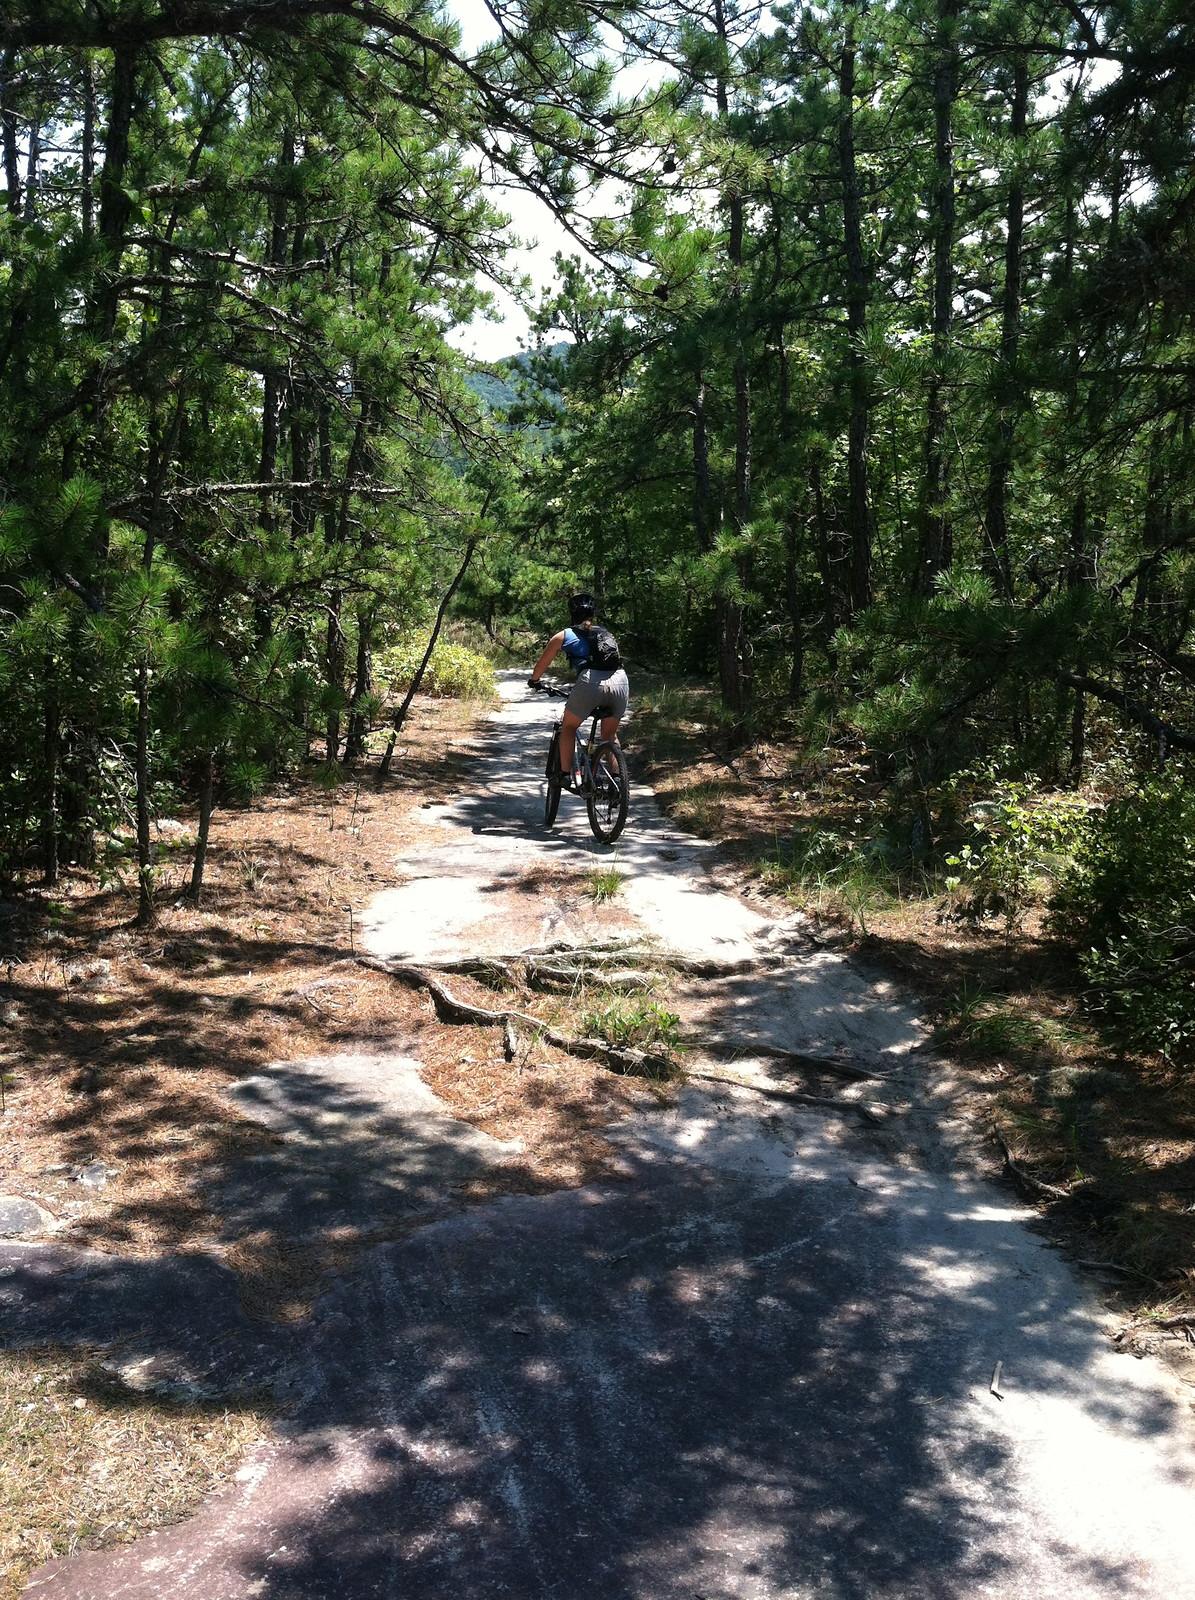 Southern Fried MTB - jason.rickles.1 - Mountain Biking Pictures - Vital MTB